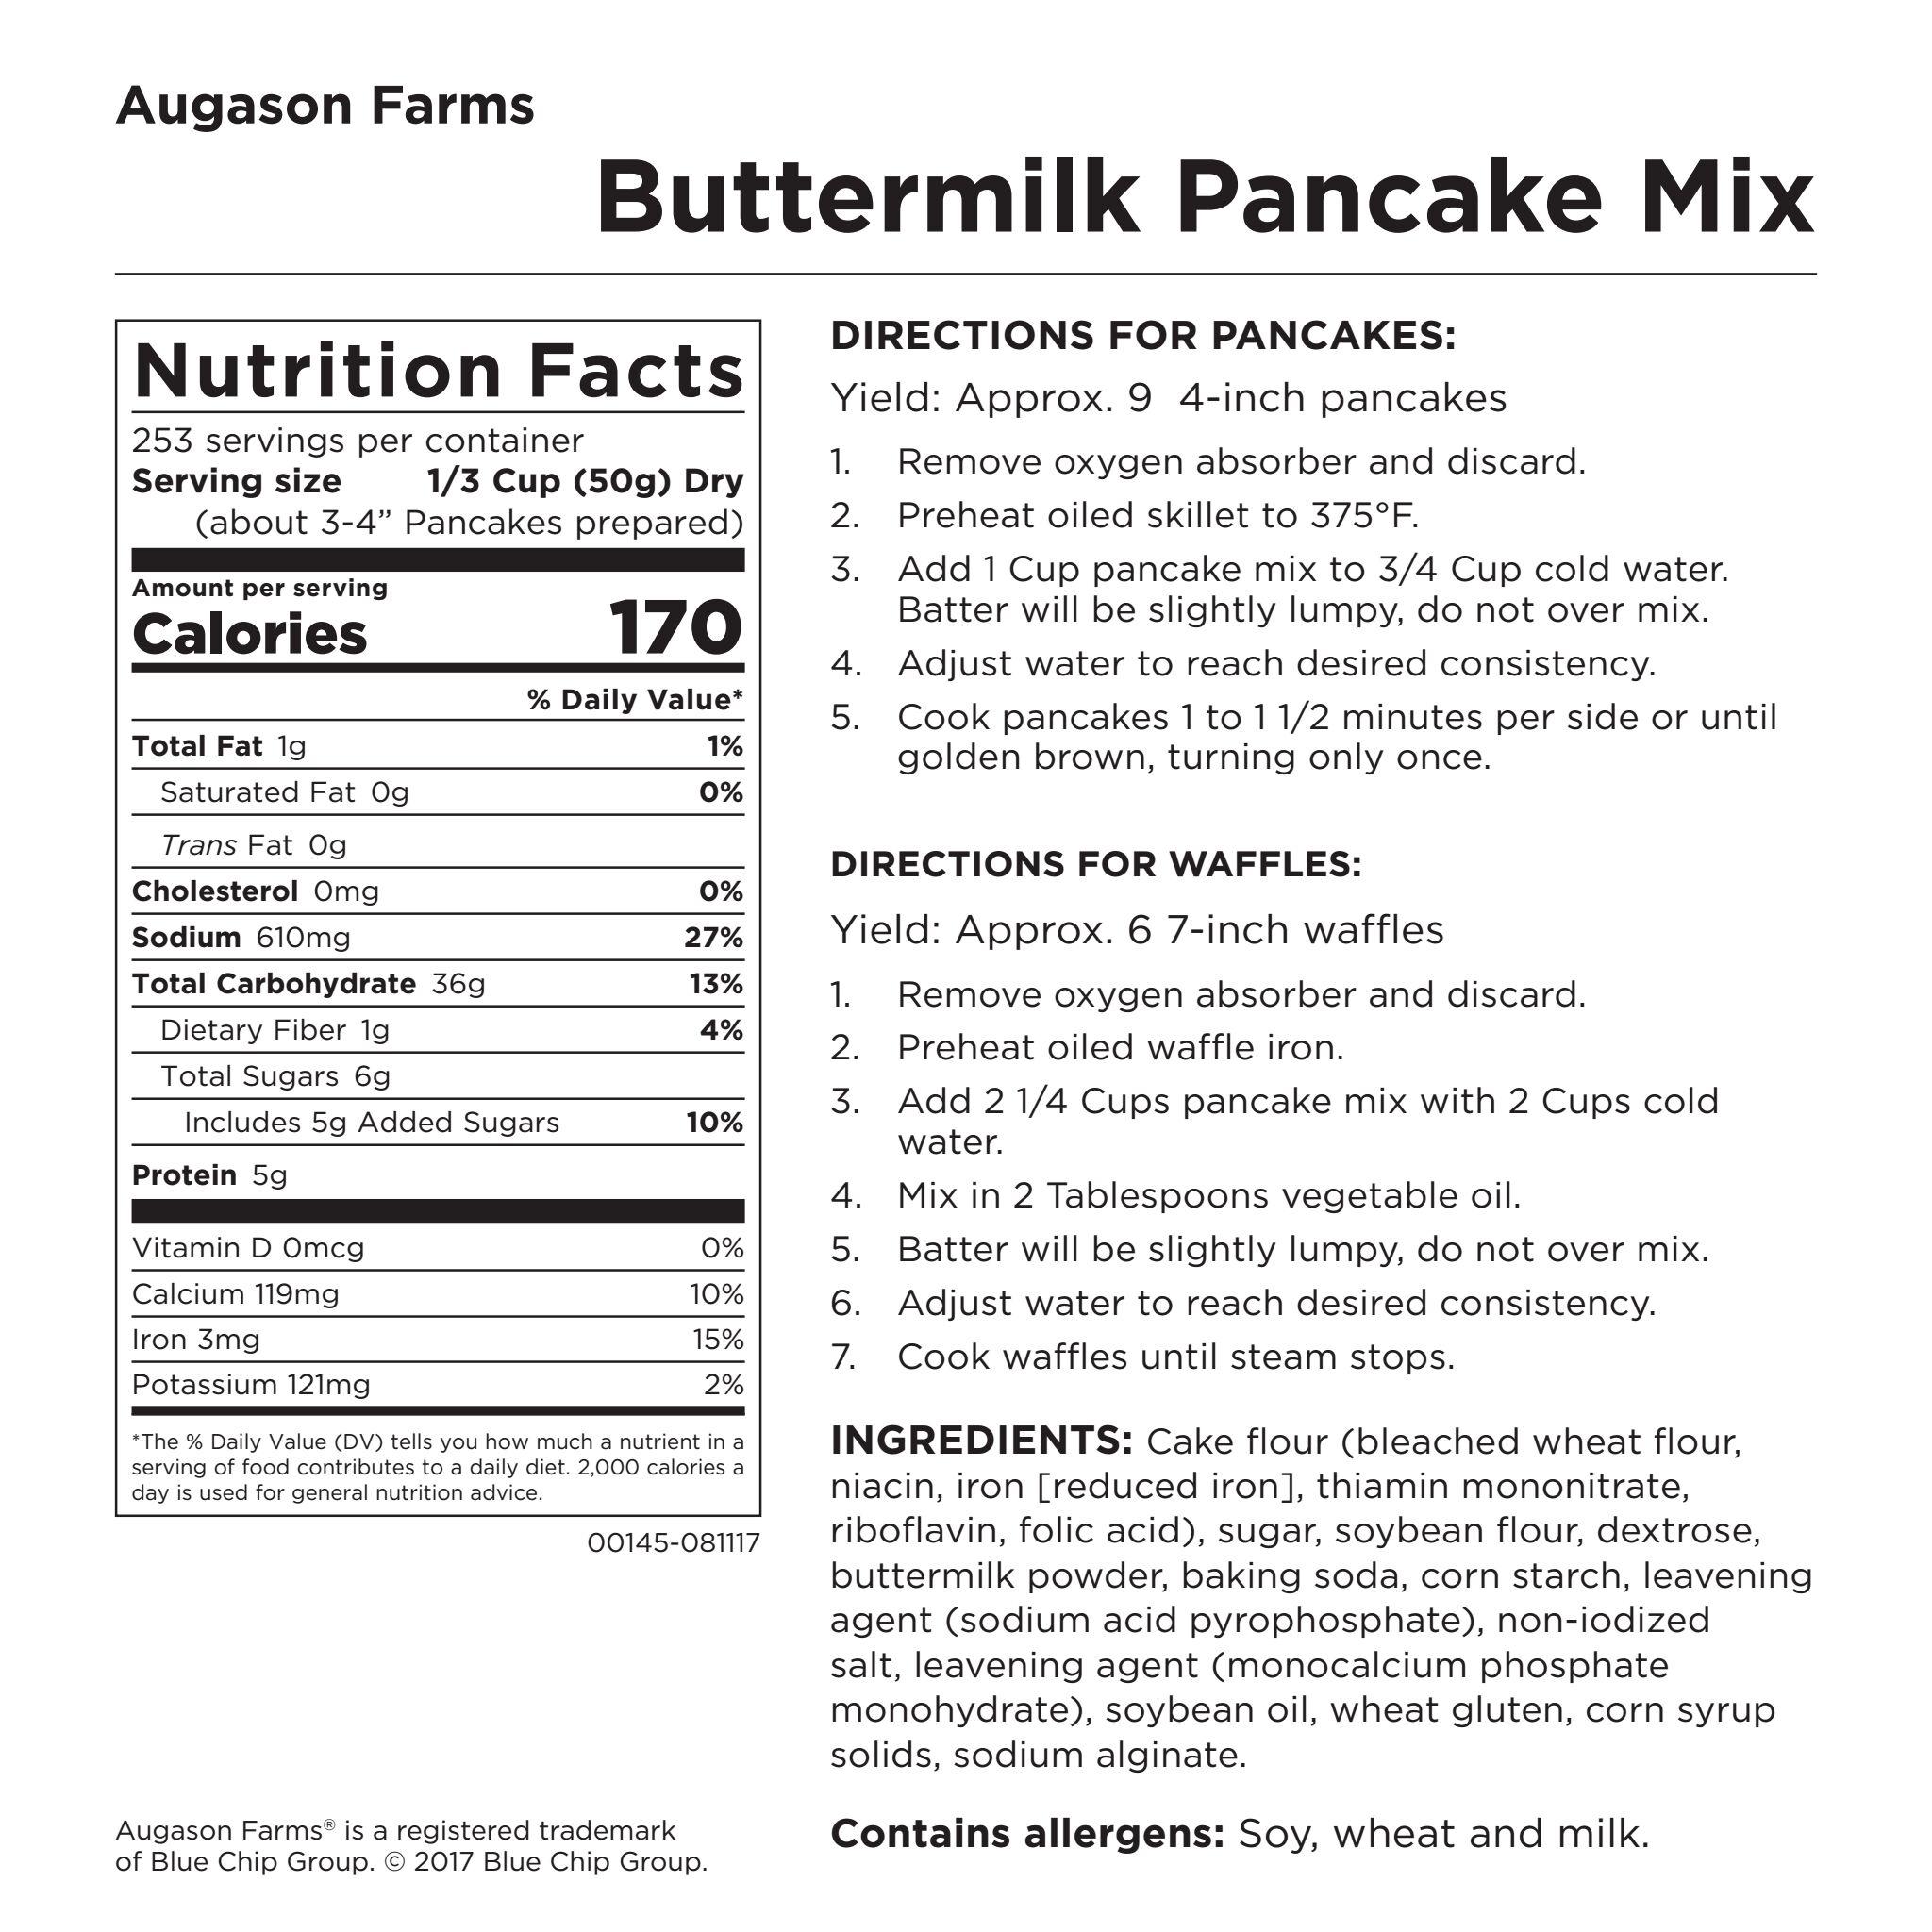 00145_AF_ButtermilkPancake_NoEgg_6G_NutritionPages_r1.0.1